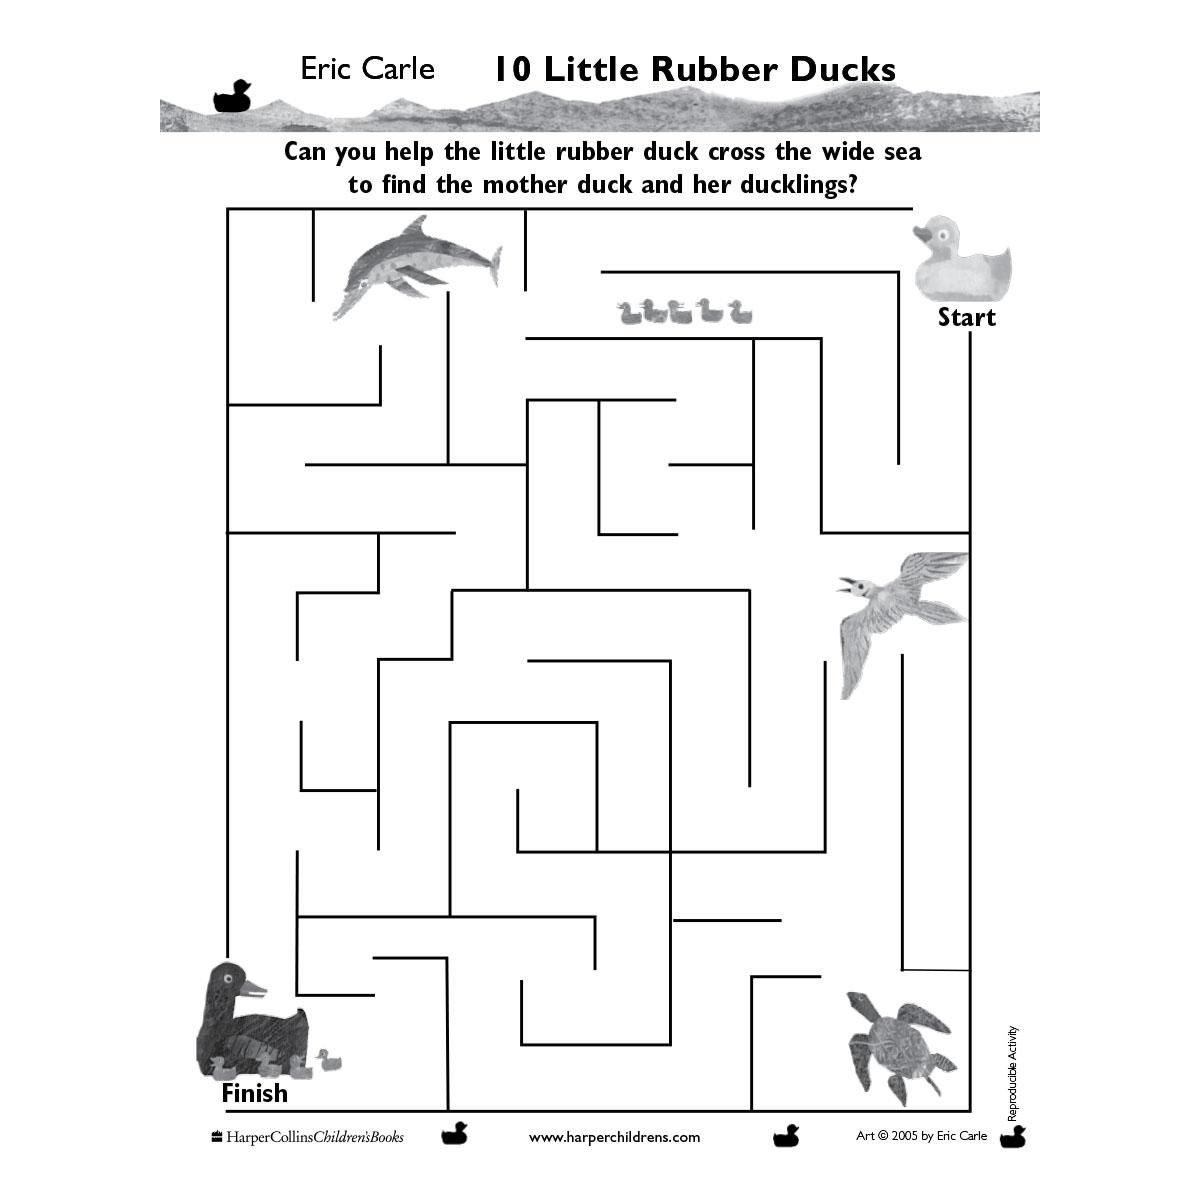 10 Little Rubber Ducks #1